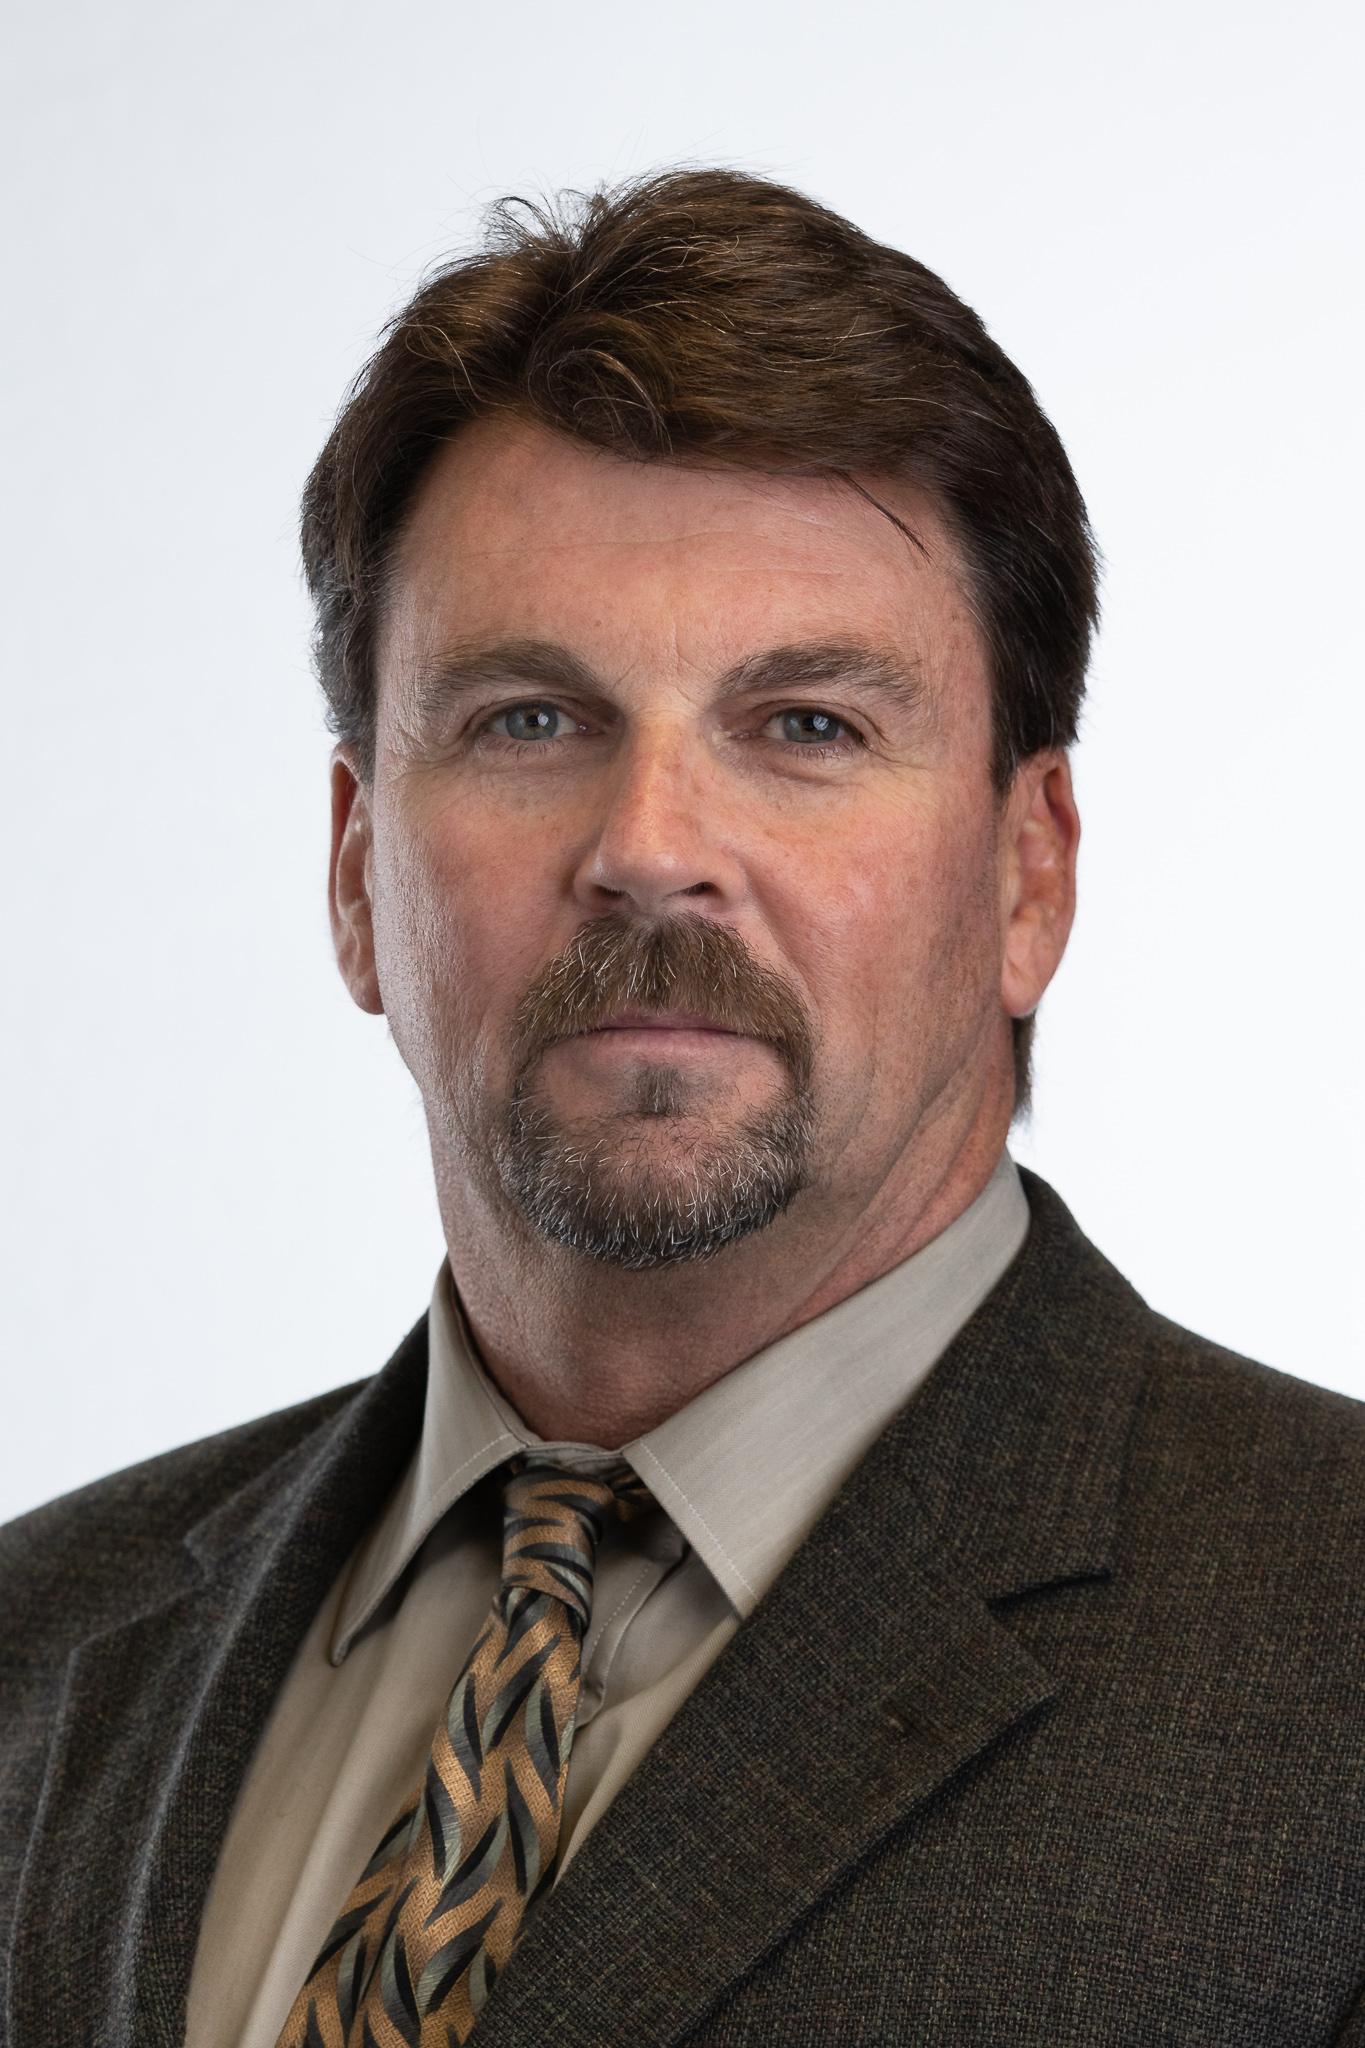 Headshot of Tim Mcintosh